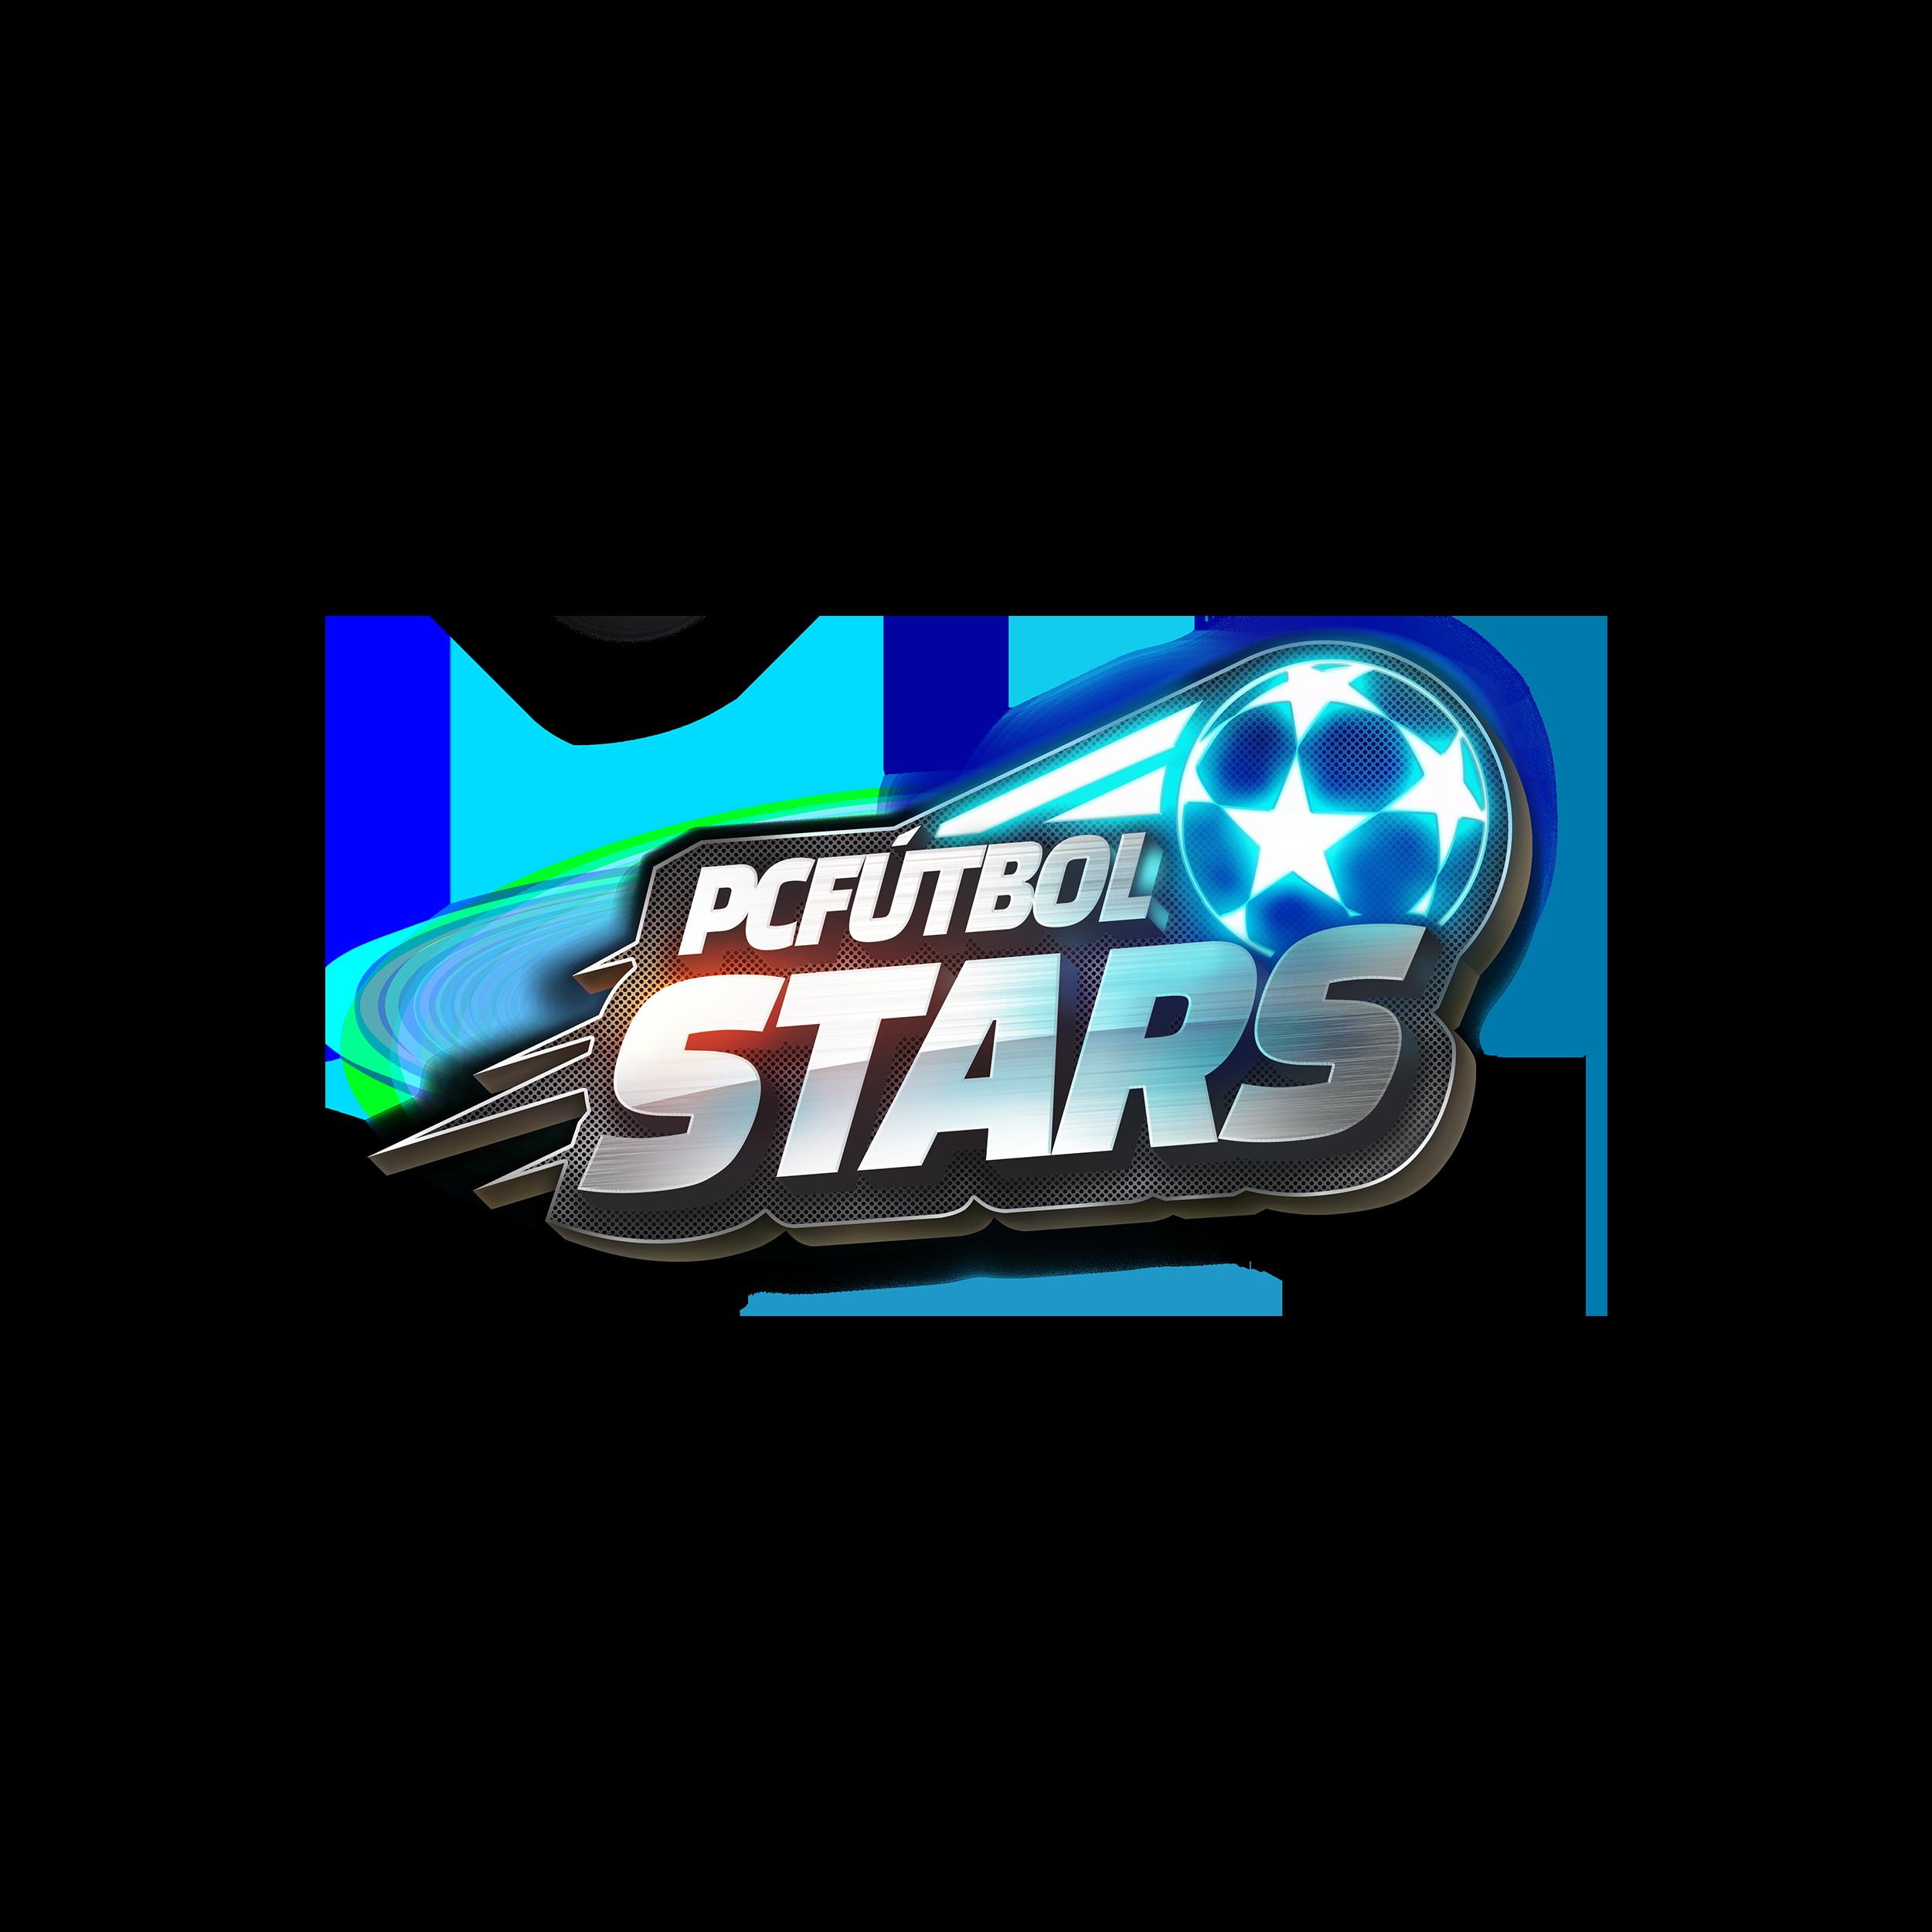 PC Fútbol Stars logo